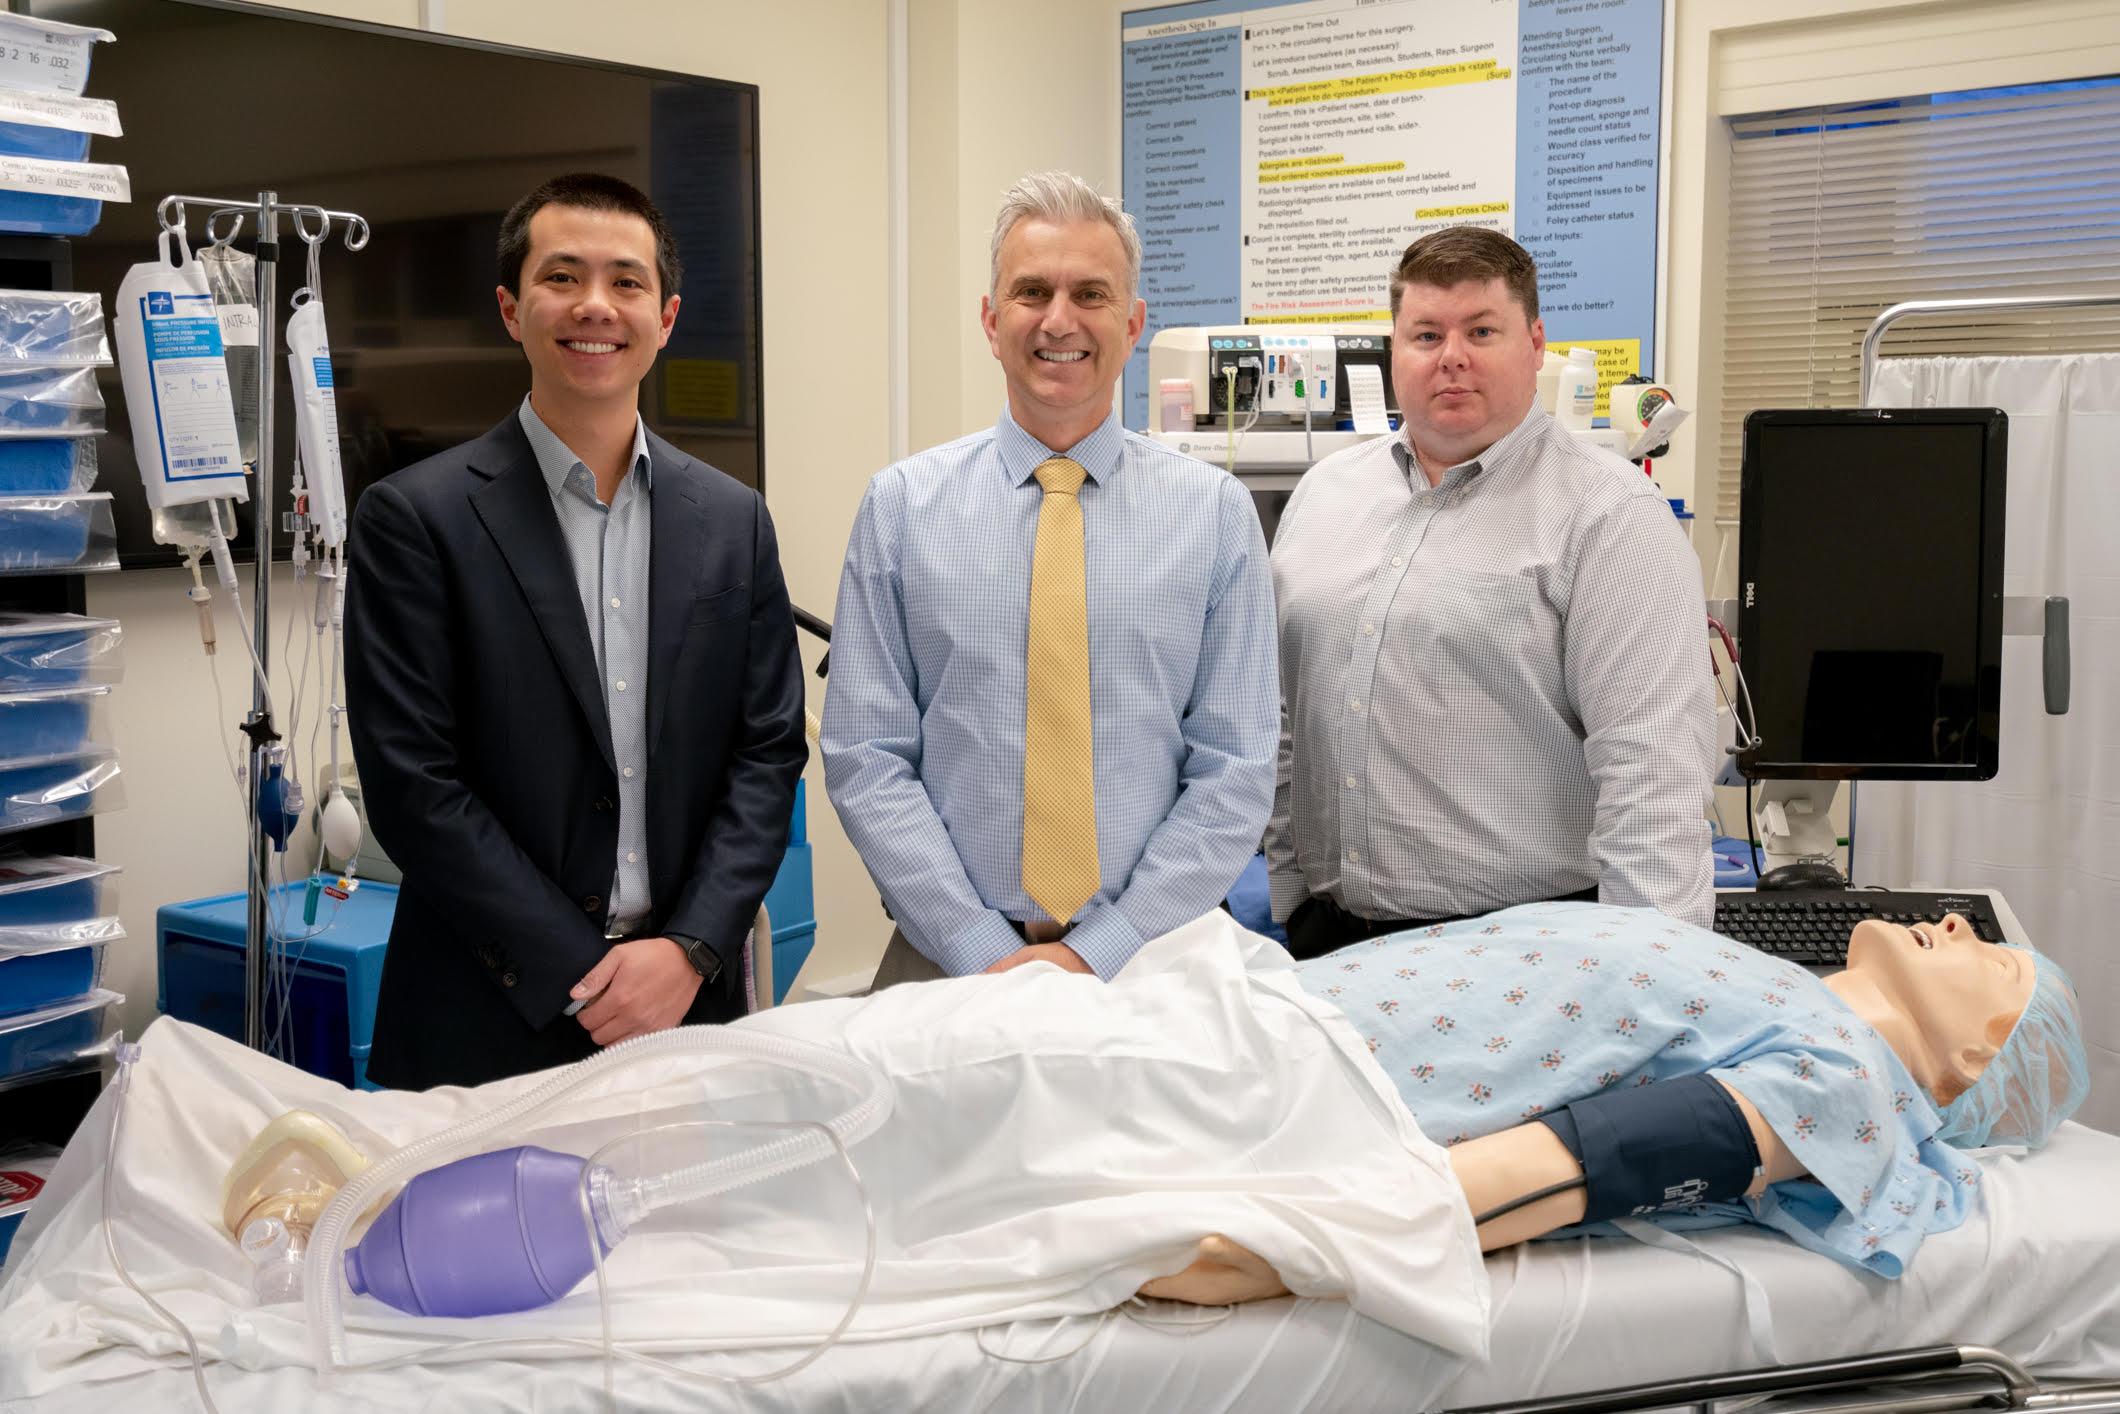 Left to Right: Michael Ma, Cameron Ricks, RN, MD, Keith Beaulieu